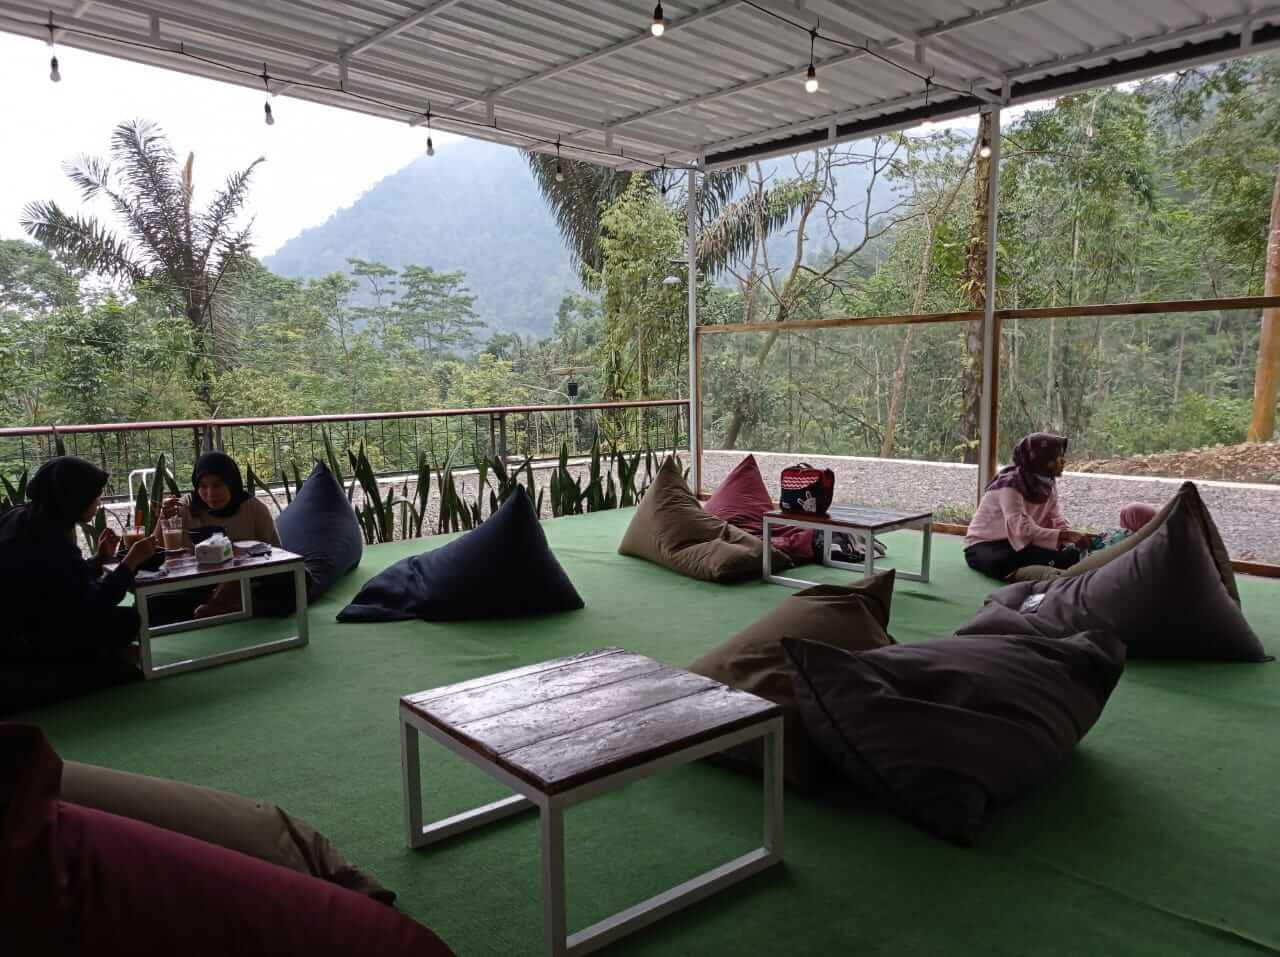 Kafe Kayoe Coffee and Barn Petungkriyono